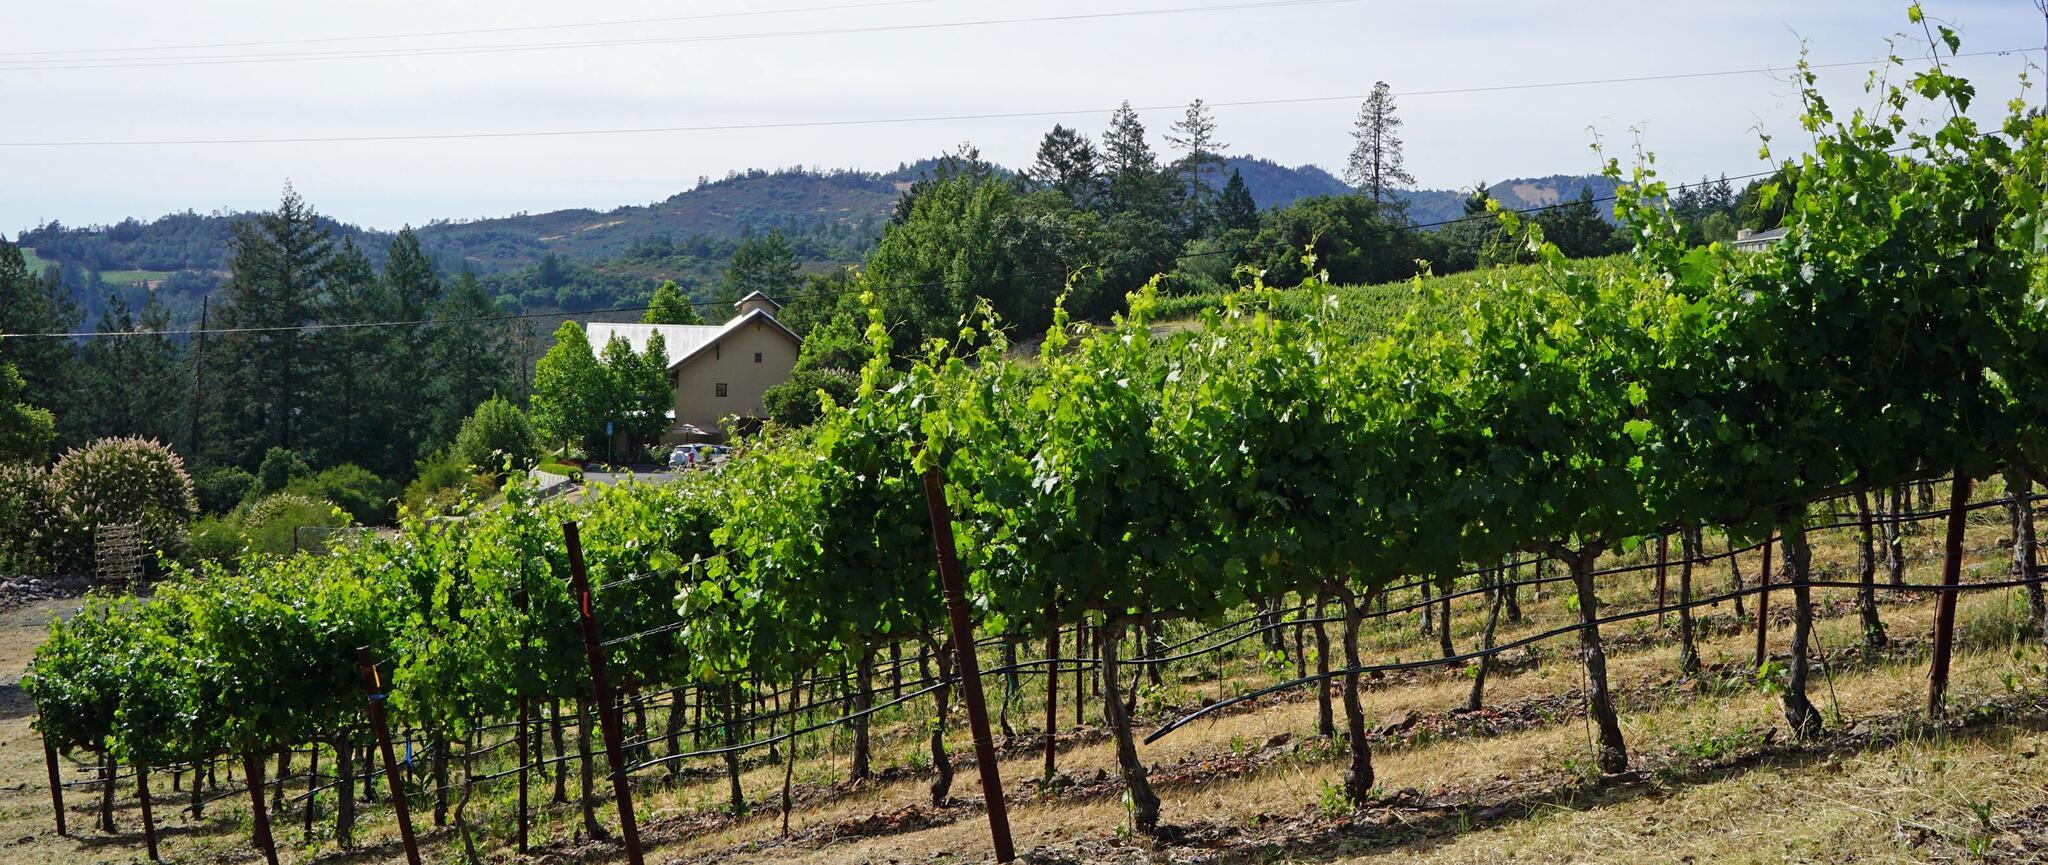 Bravante Vineyards Cover Image